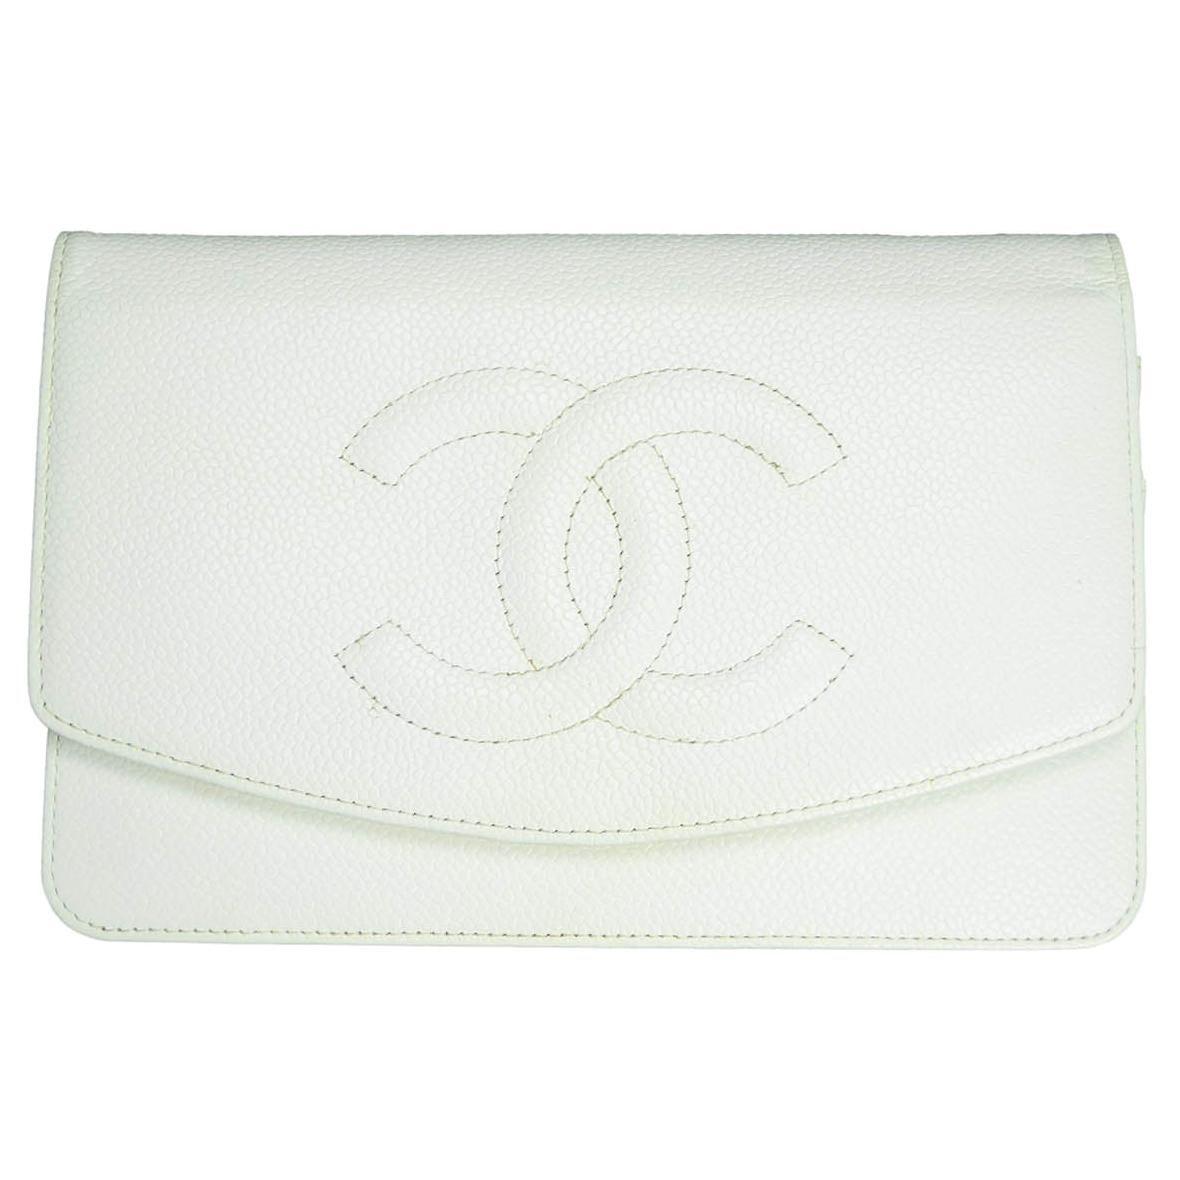 Chanel White Caviar Timeless CC Wallet on Chain WOC Crossbody Bag